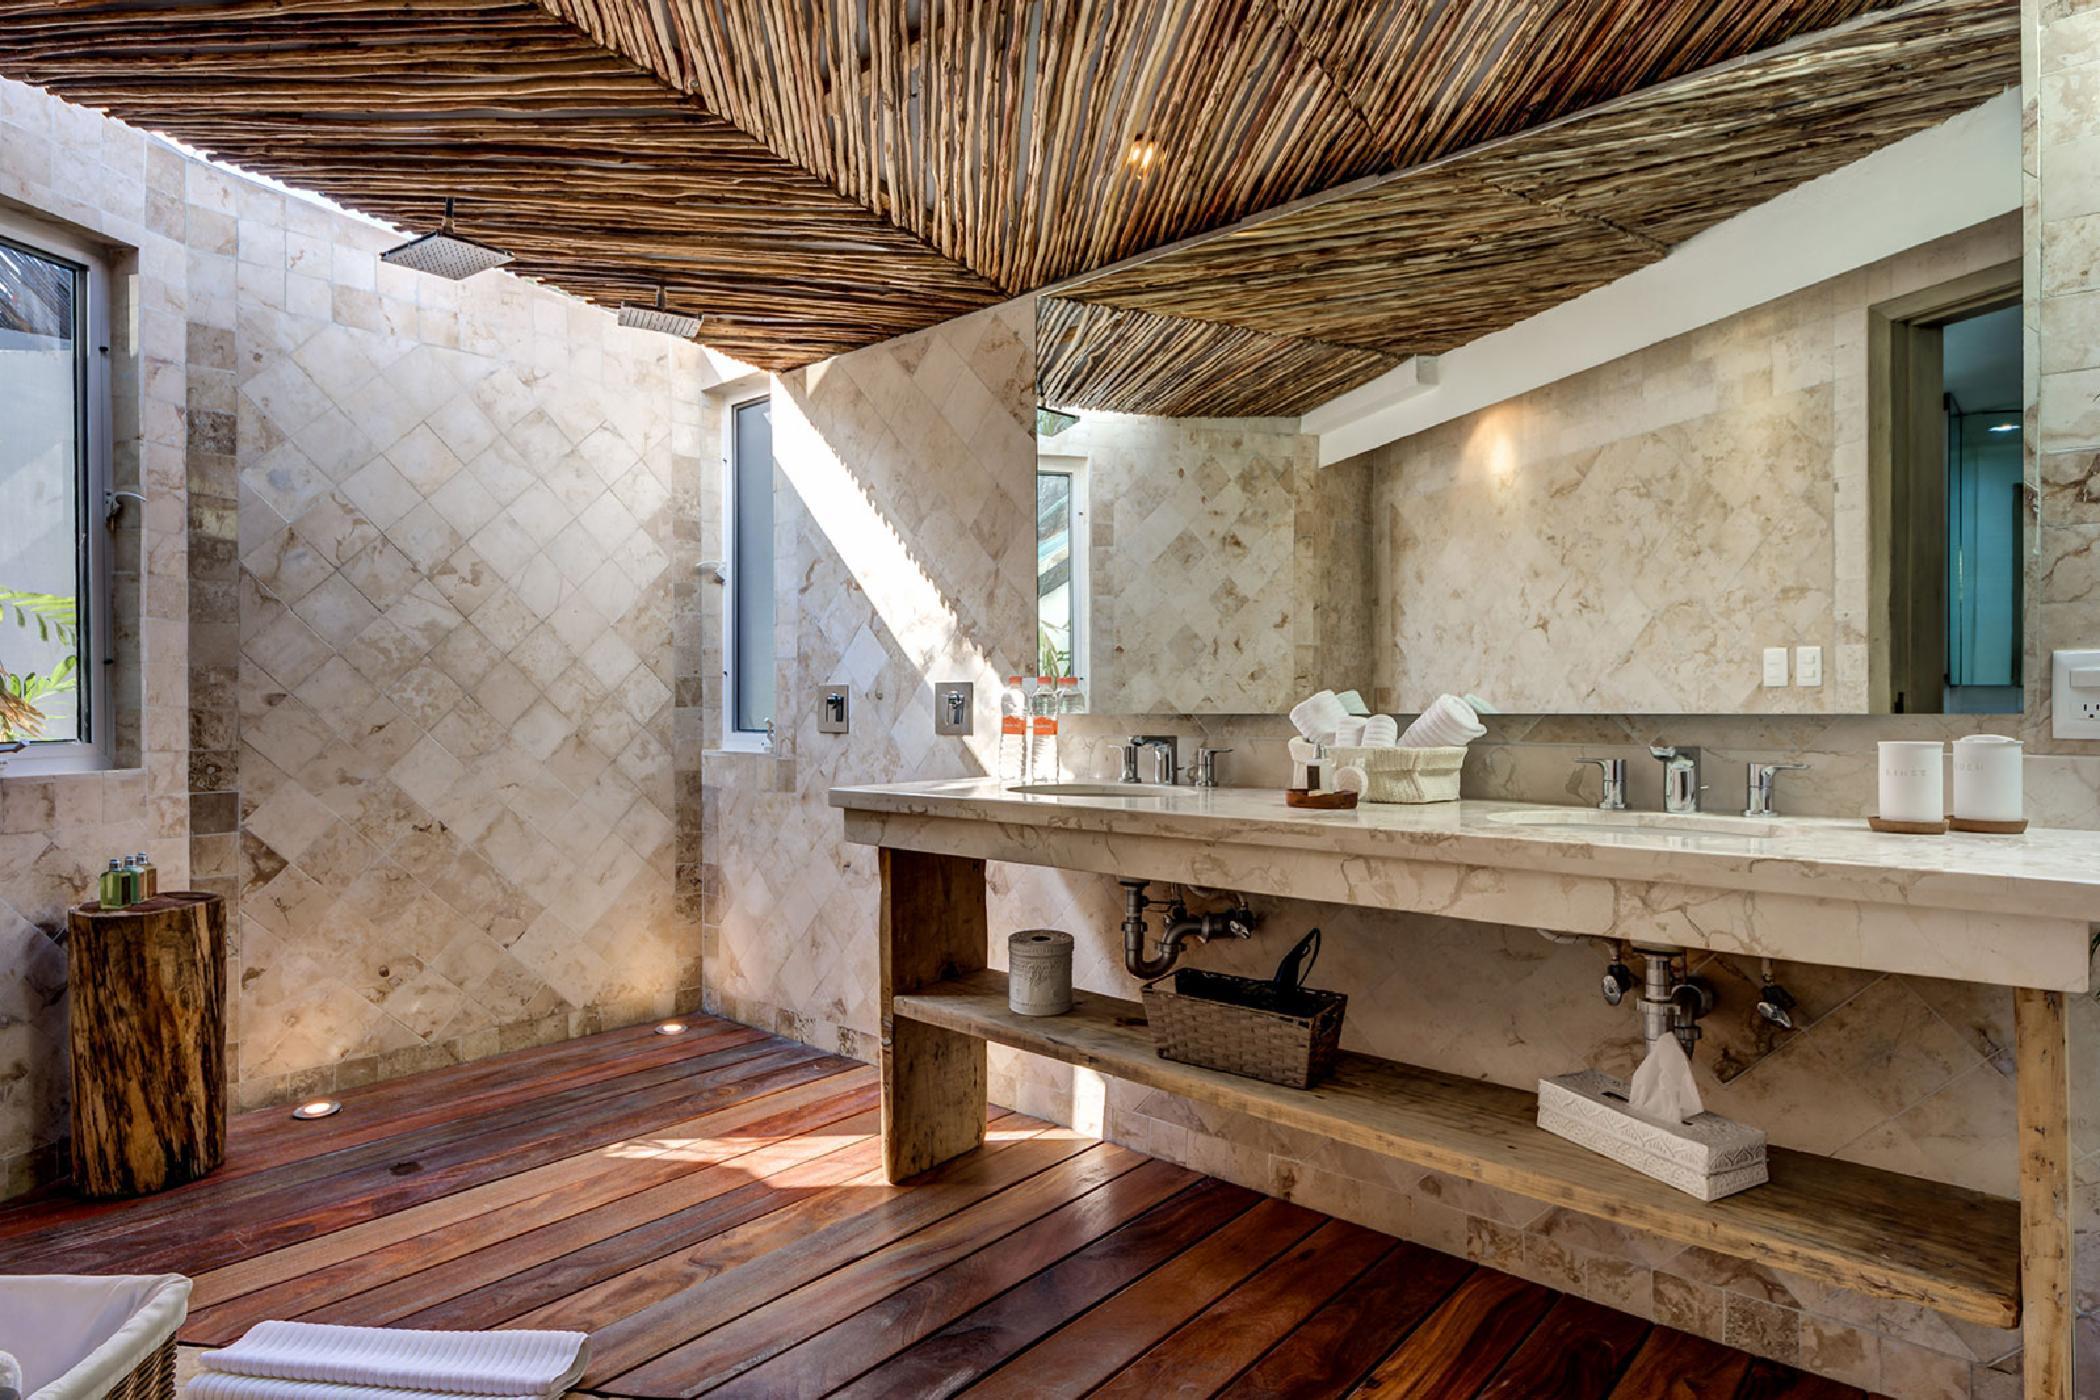 Maya_Luxe_Riviera_Maya_Luxury_Villas_Experiences_Puerto_Aventuras_5_Bedrooms_Zacil_Na_24.jpg